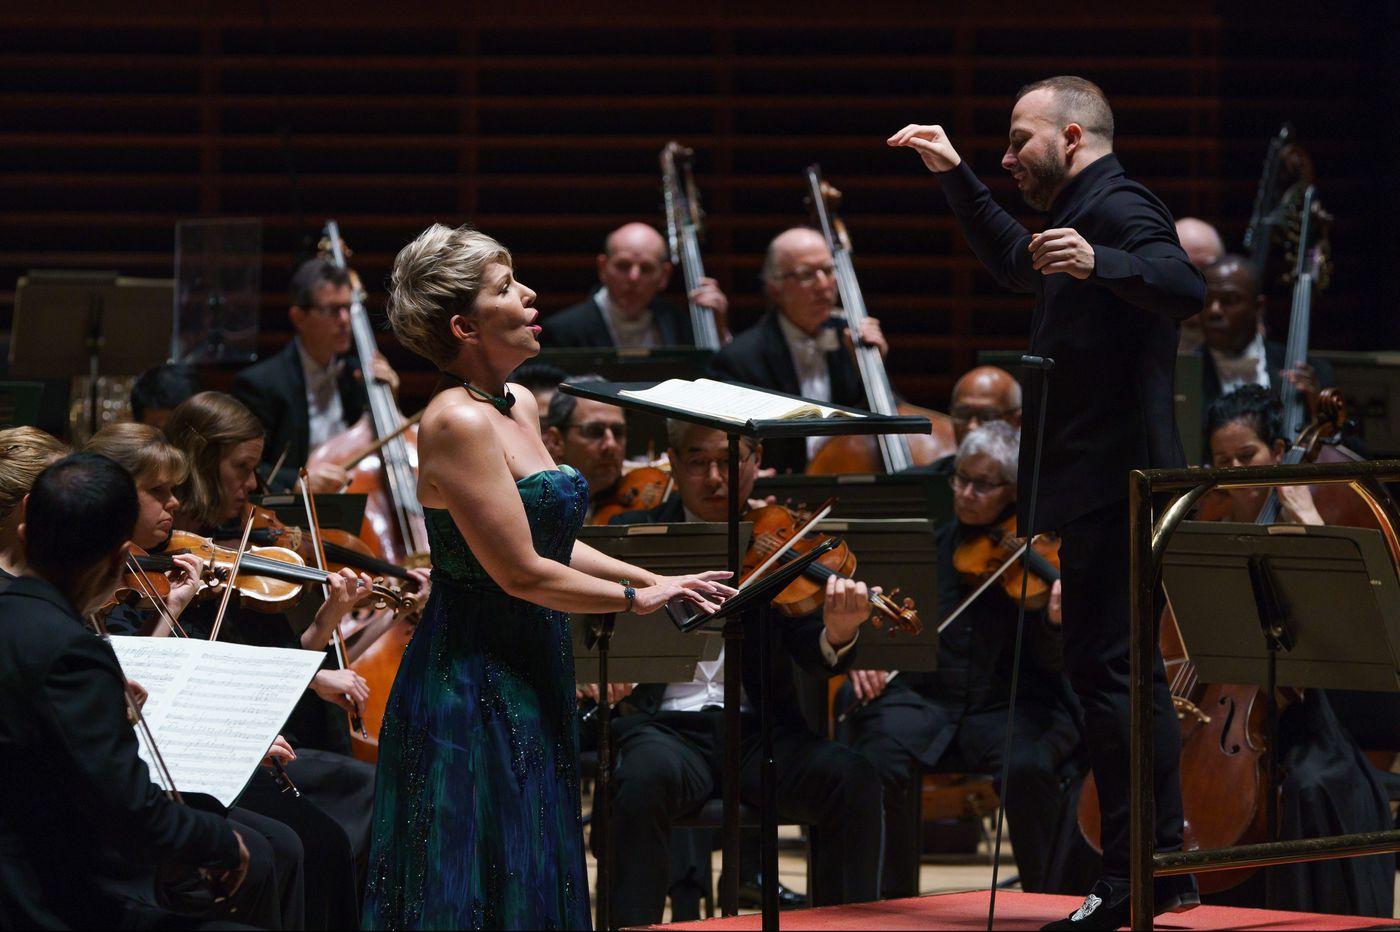 Joyce DiDonato and Yannick Nézet-Séguin pair their star power at Philadelphia Orchestra